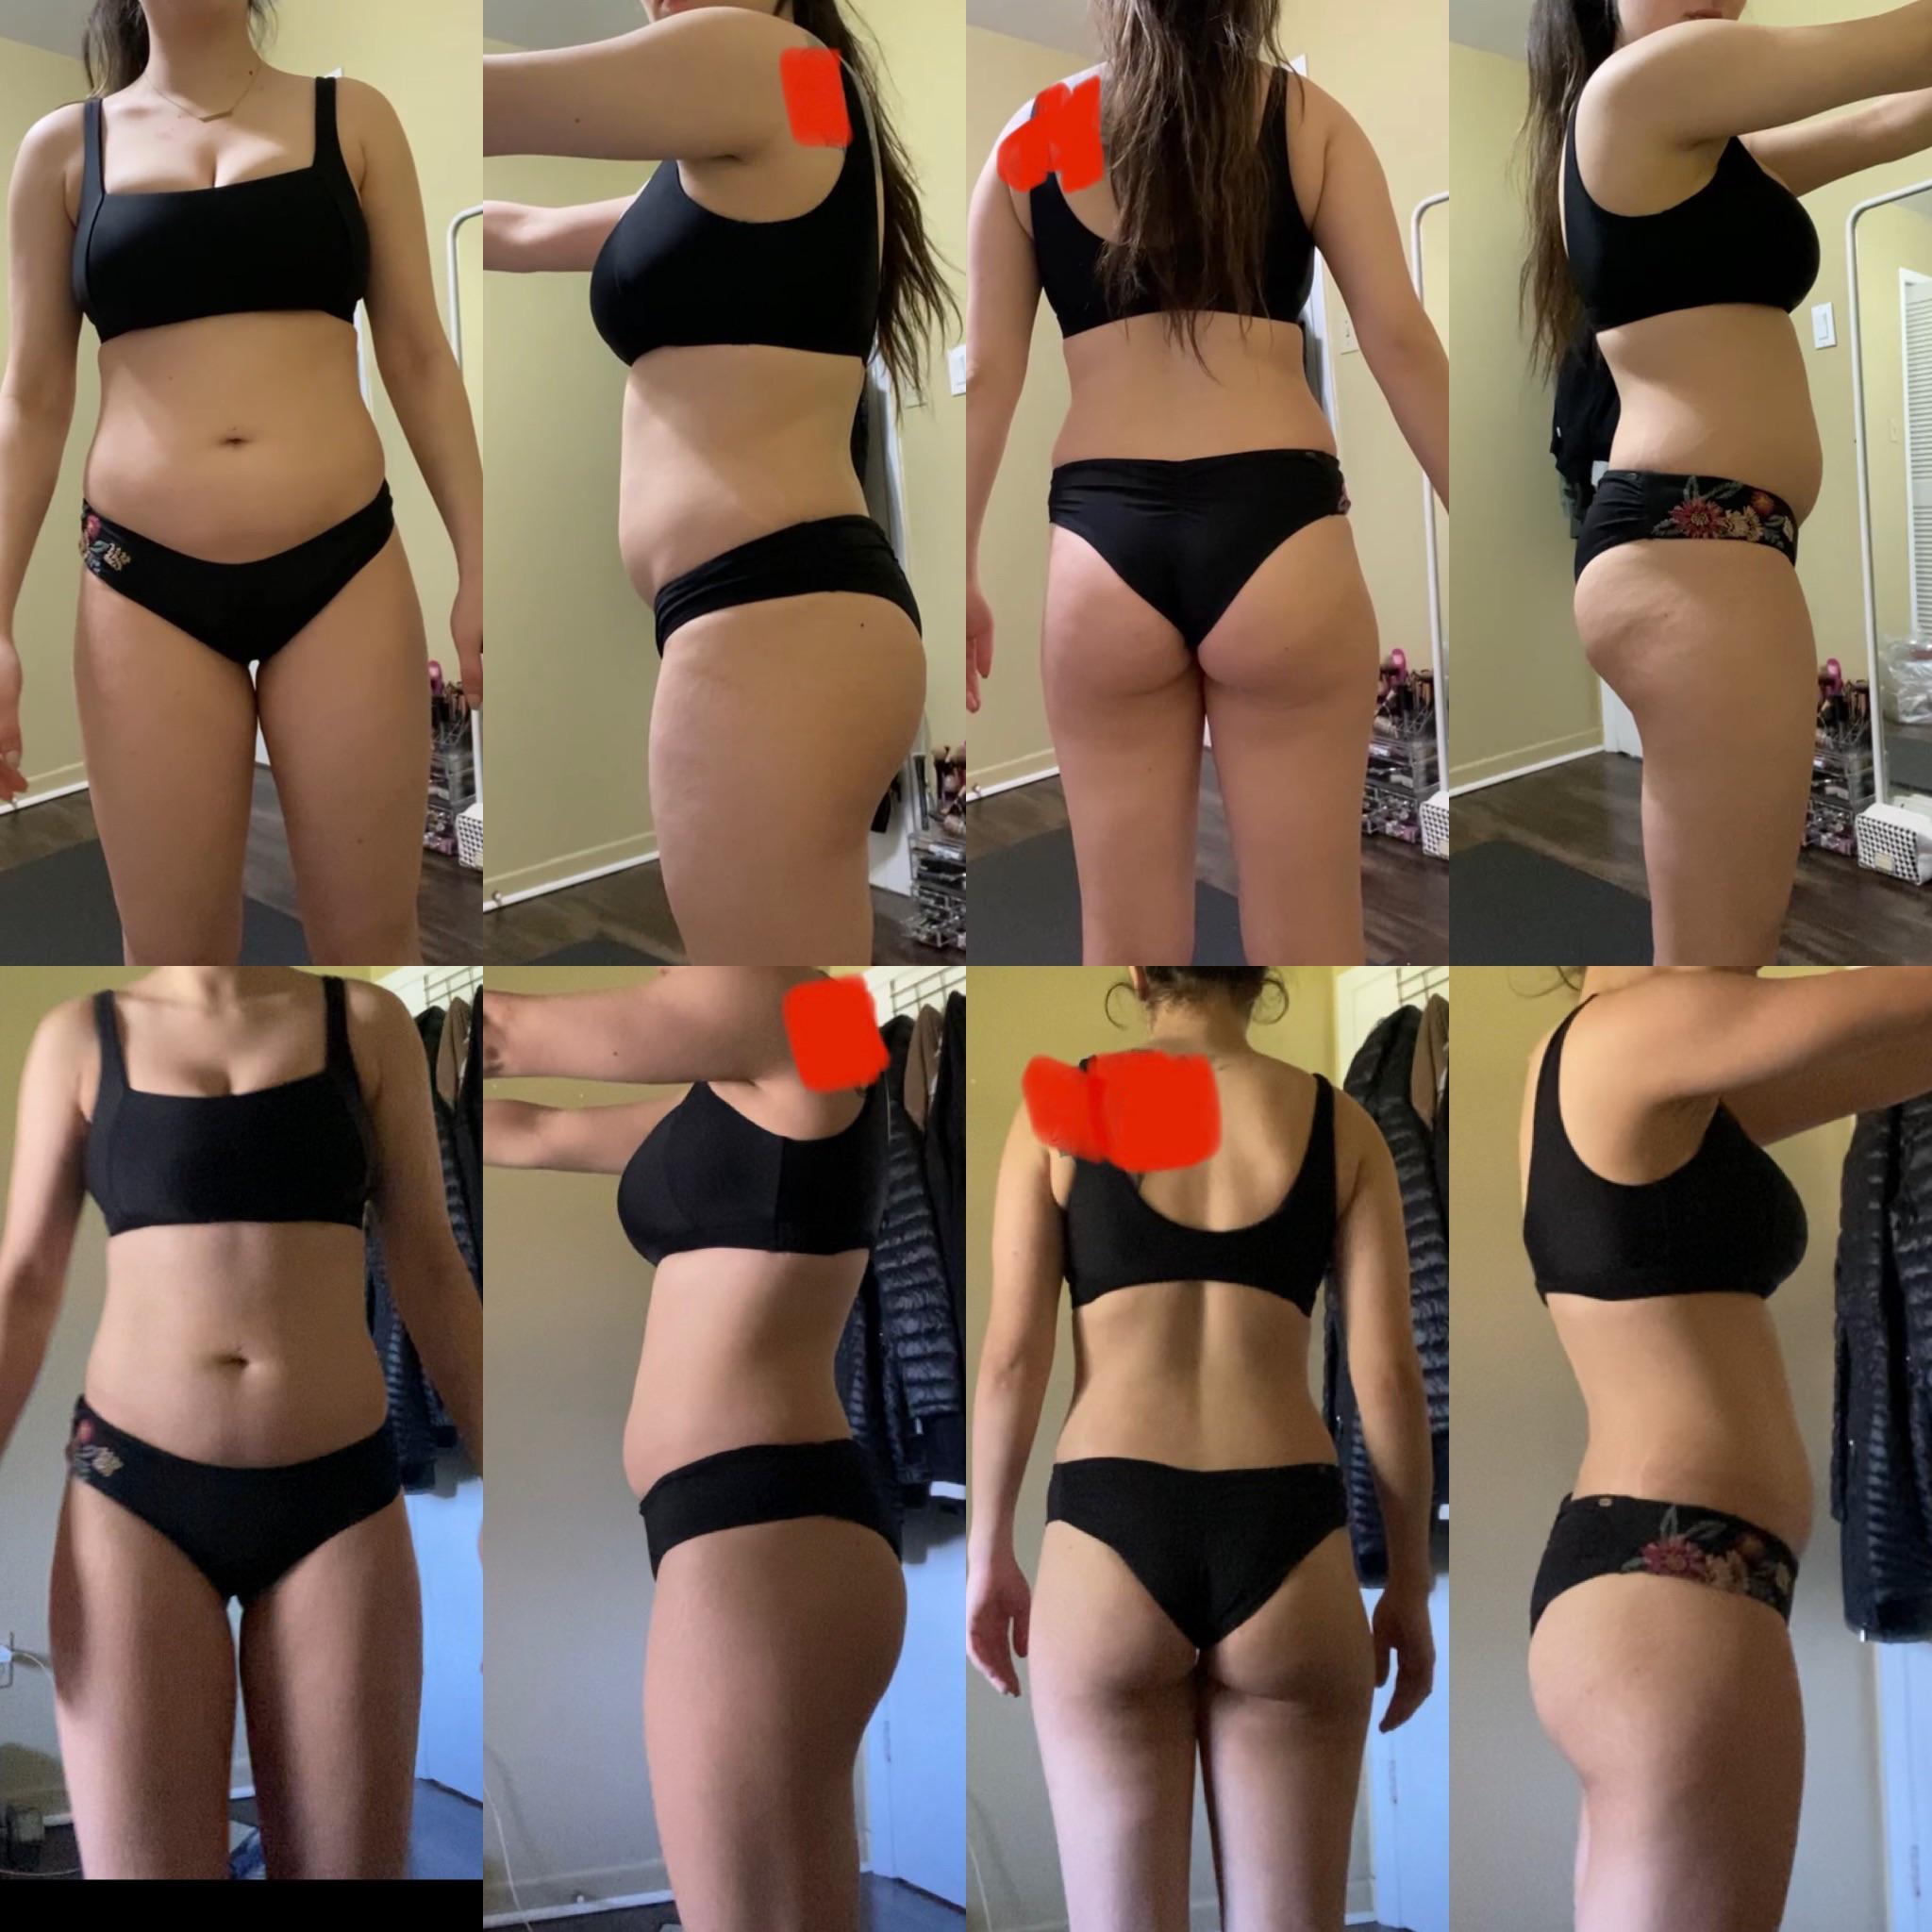 5'4 Female Progress Pics of 11 lbs Weight Loss 133 lbs to 122 lbs